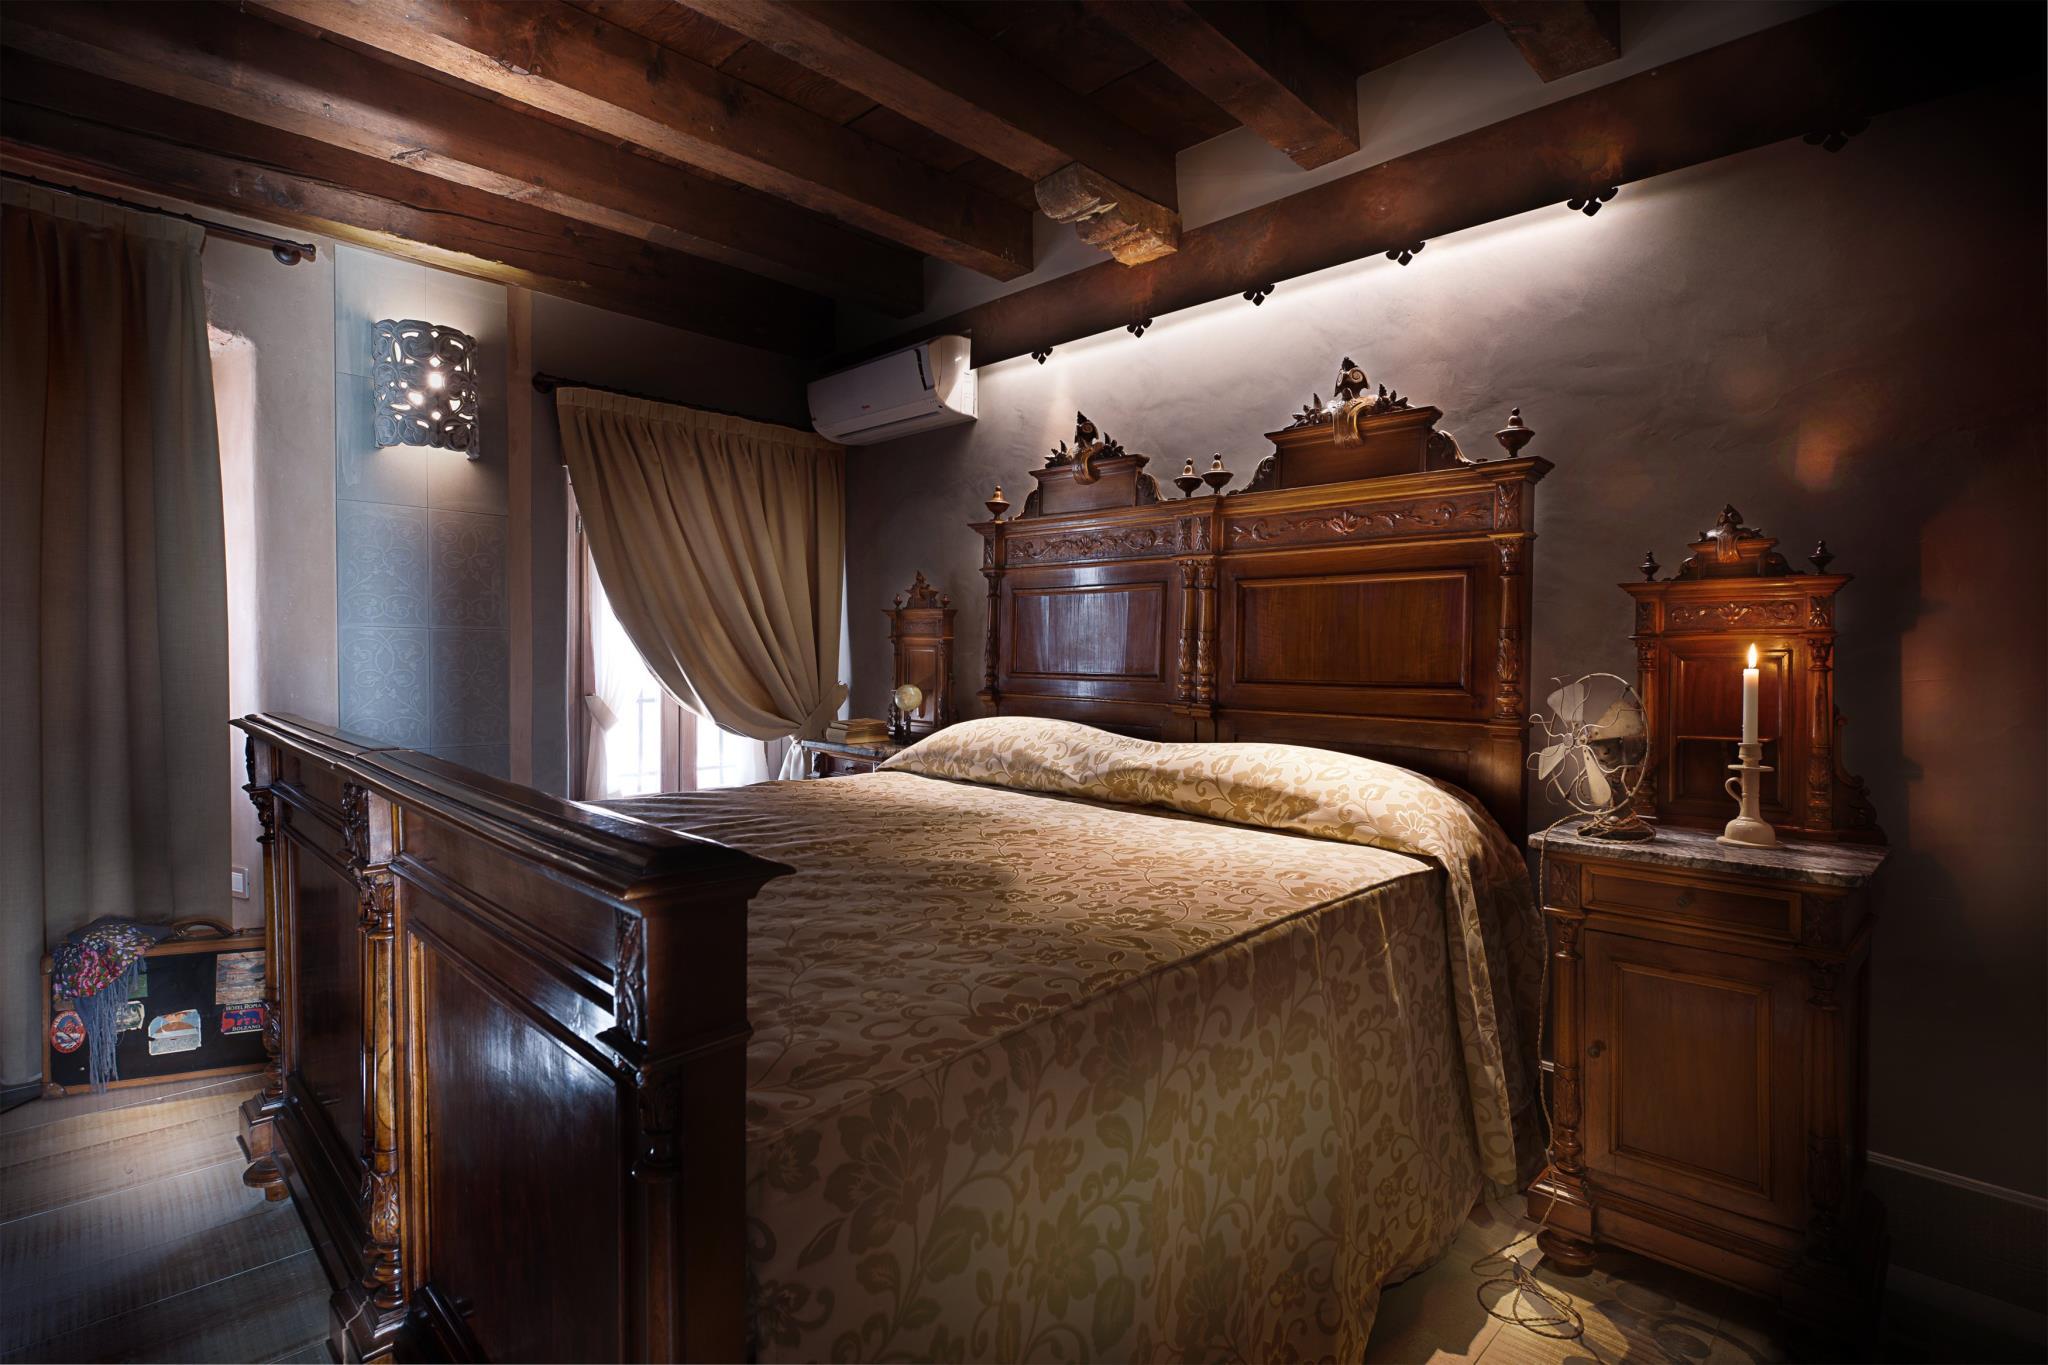 Boutique Hotel Villa Dei Campi Deals Booking Wego Ly